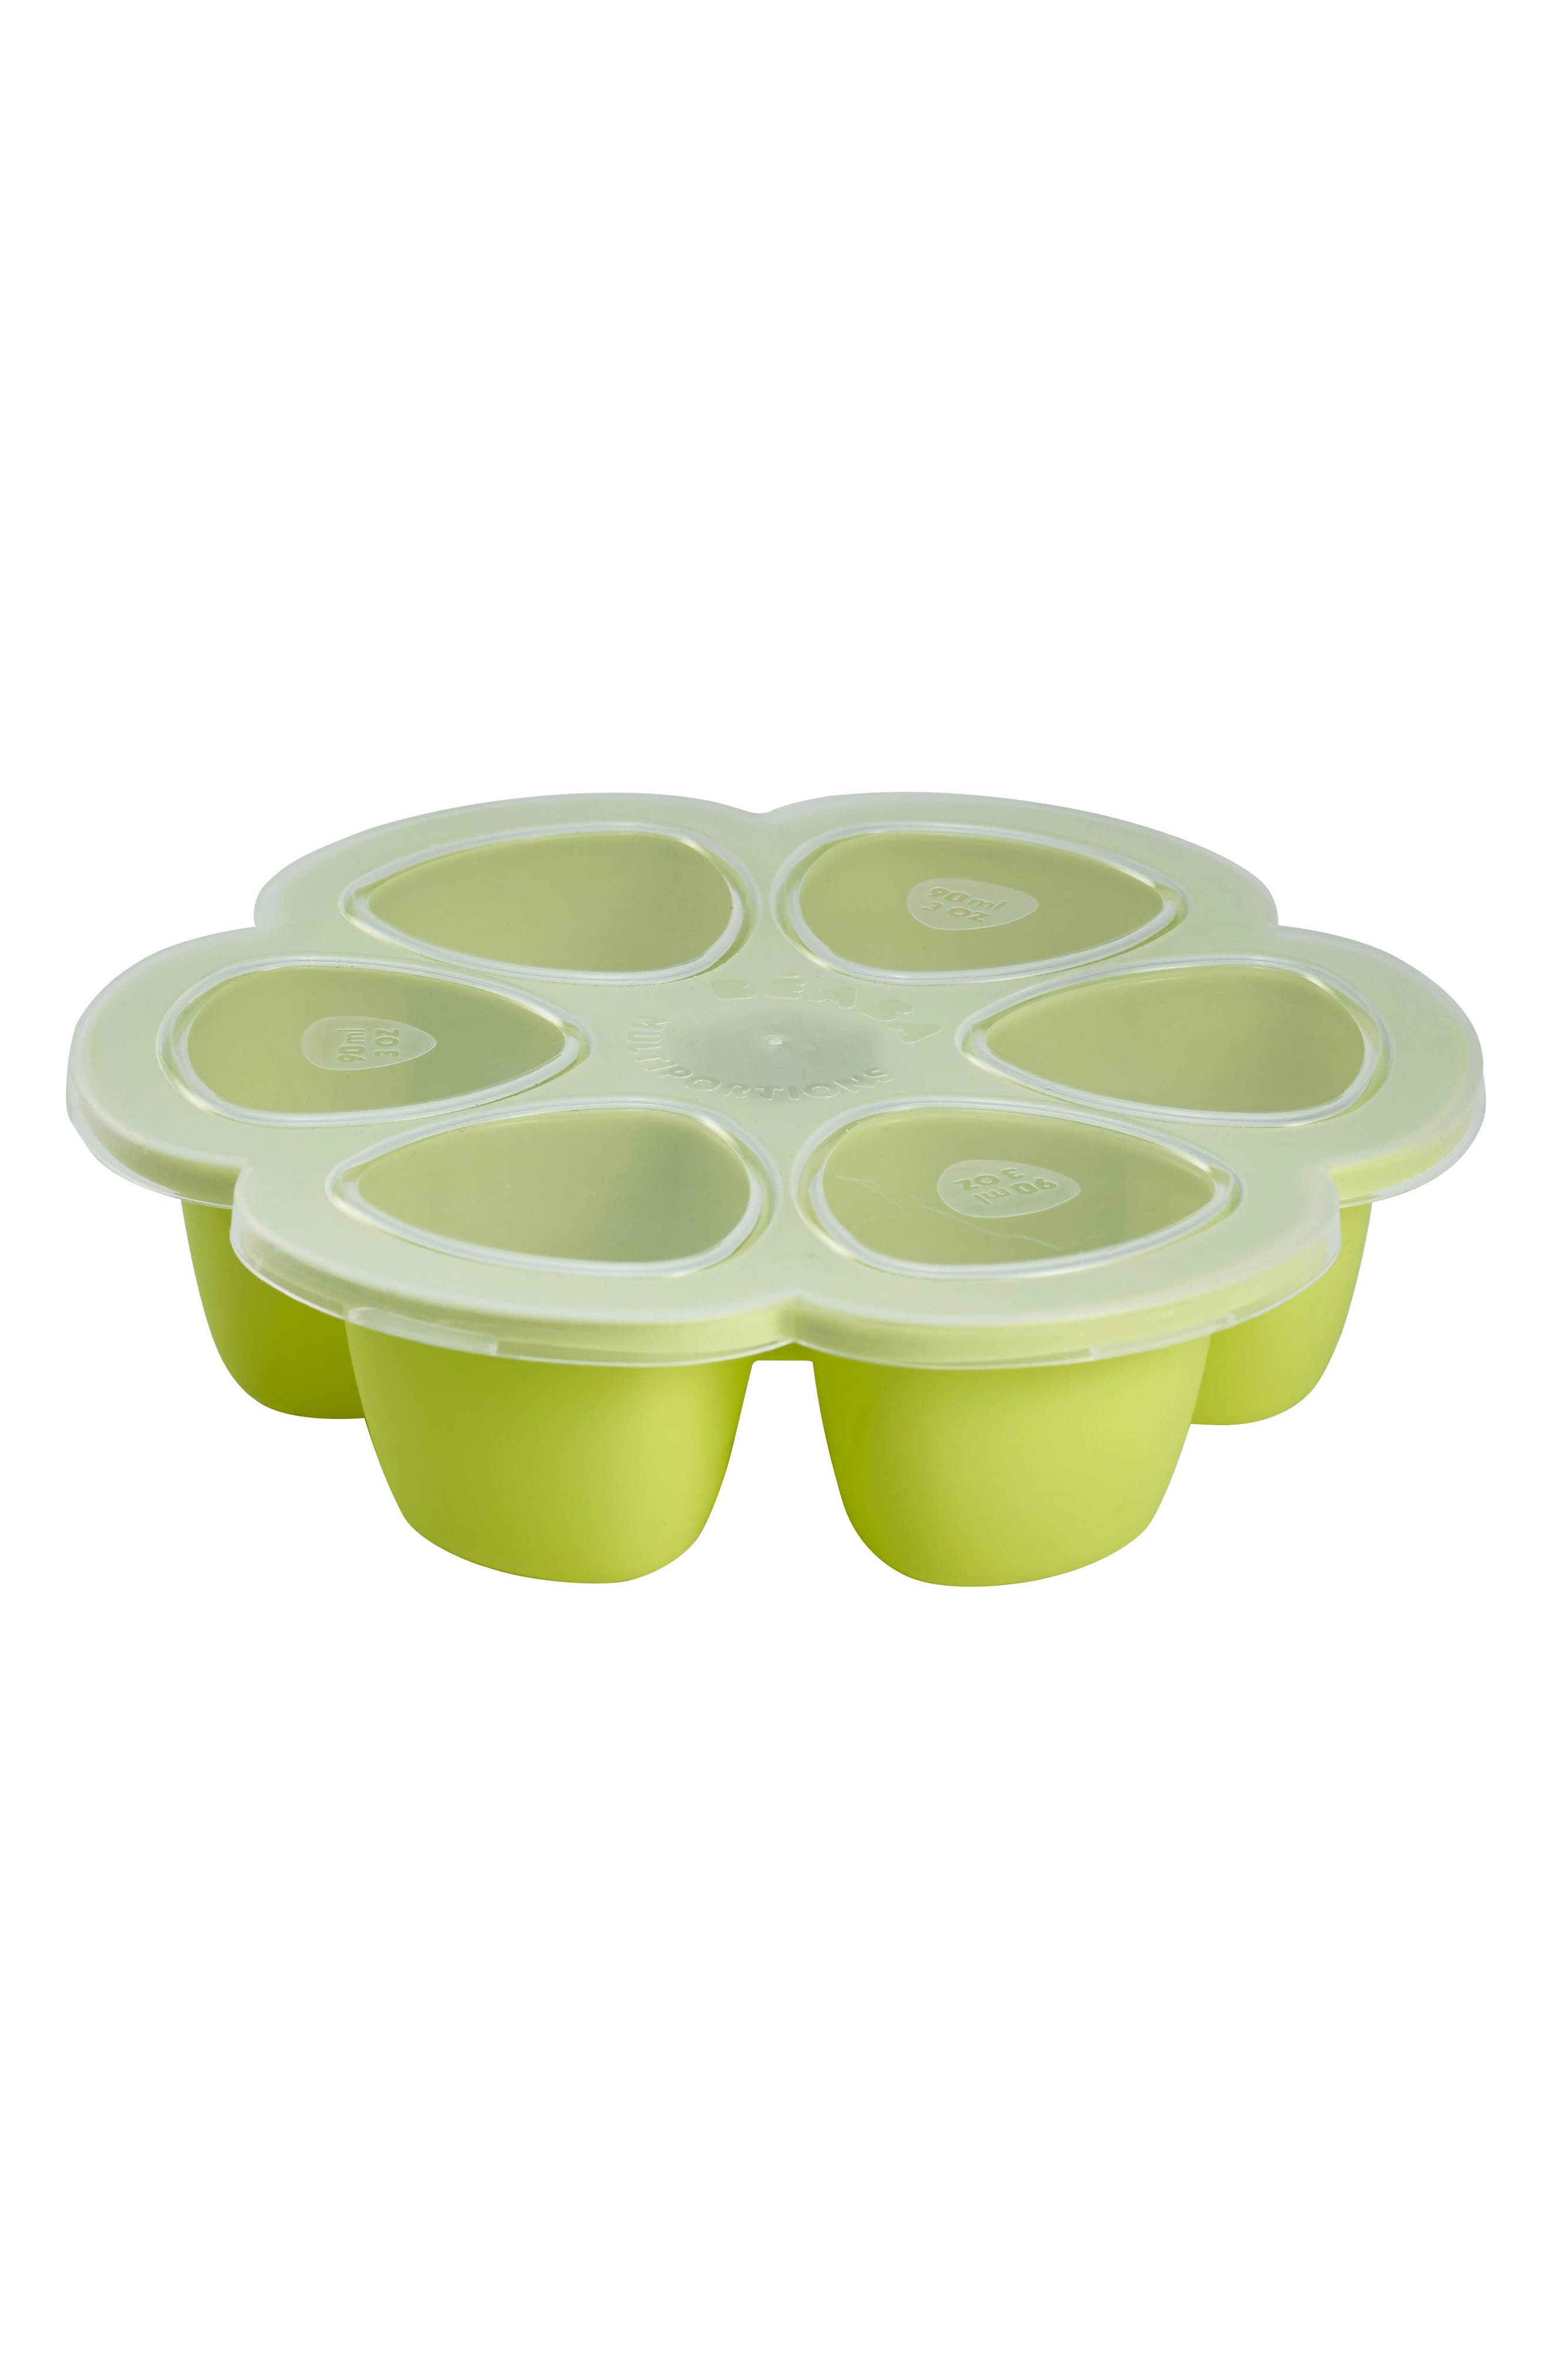 BÉABA 'Multiportions™' Silicone 5 oz. Food Cup Tray